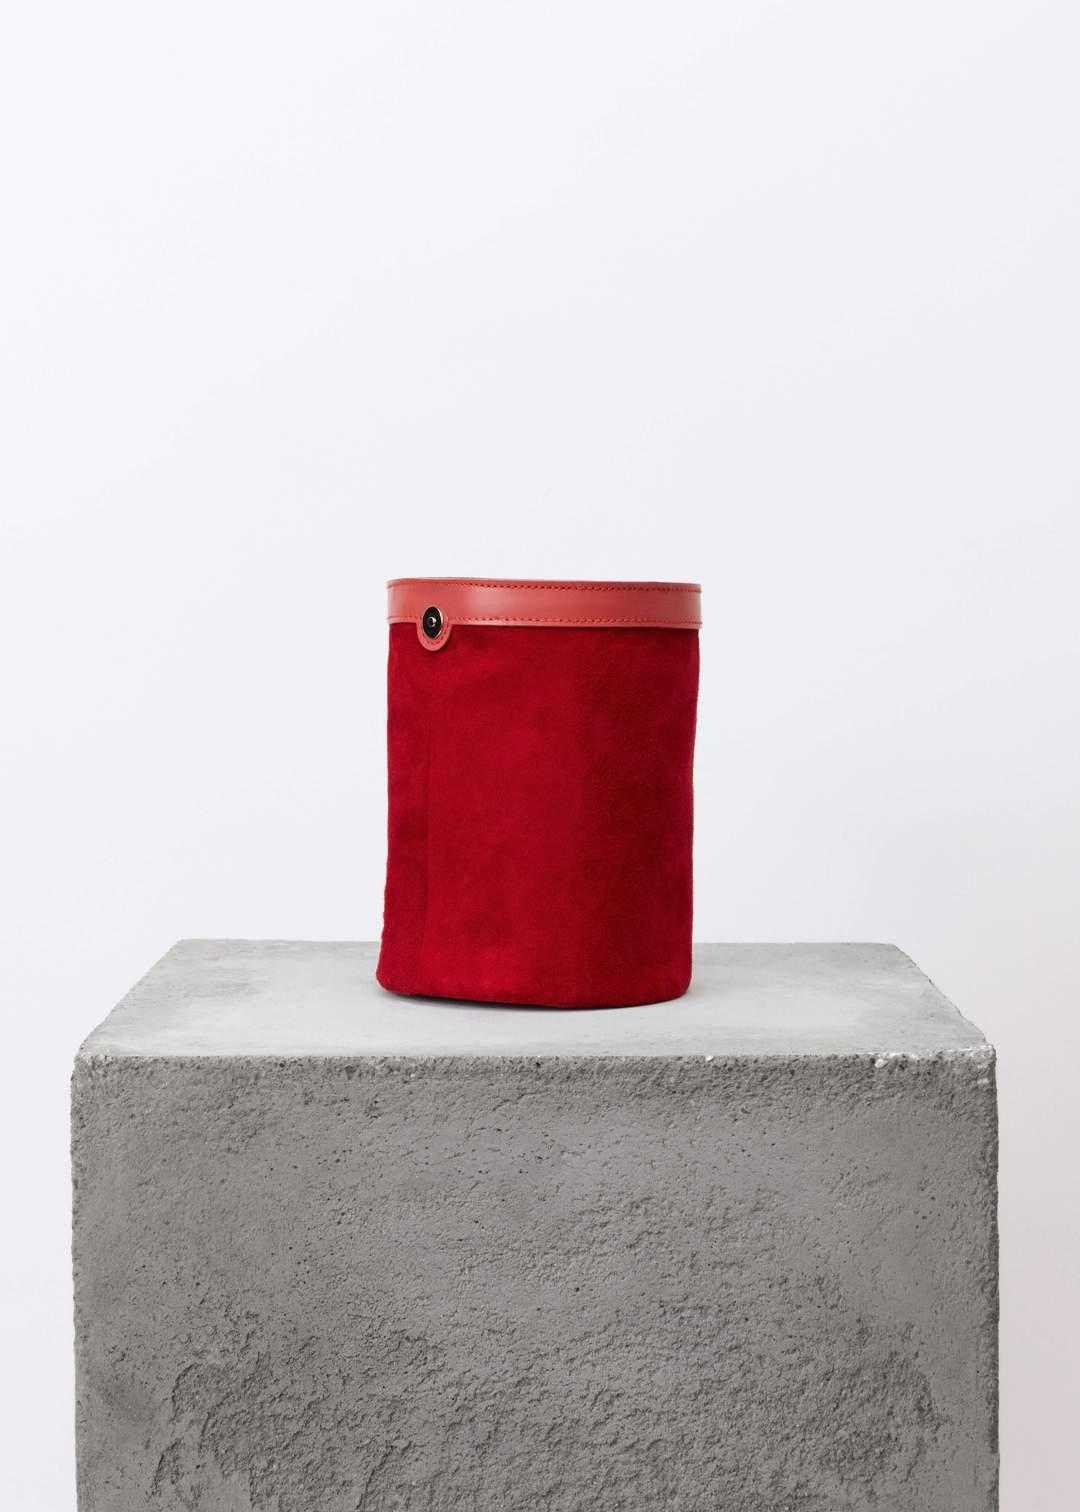 Product Image for Basket Bag, Salmon Bordeaux